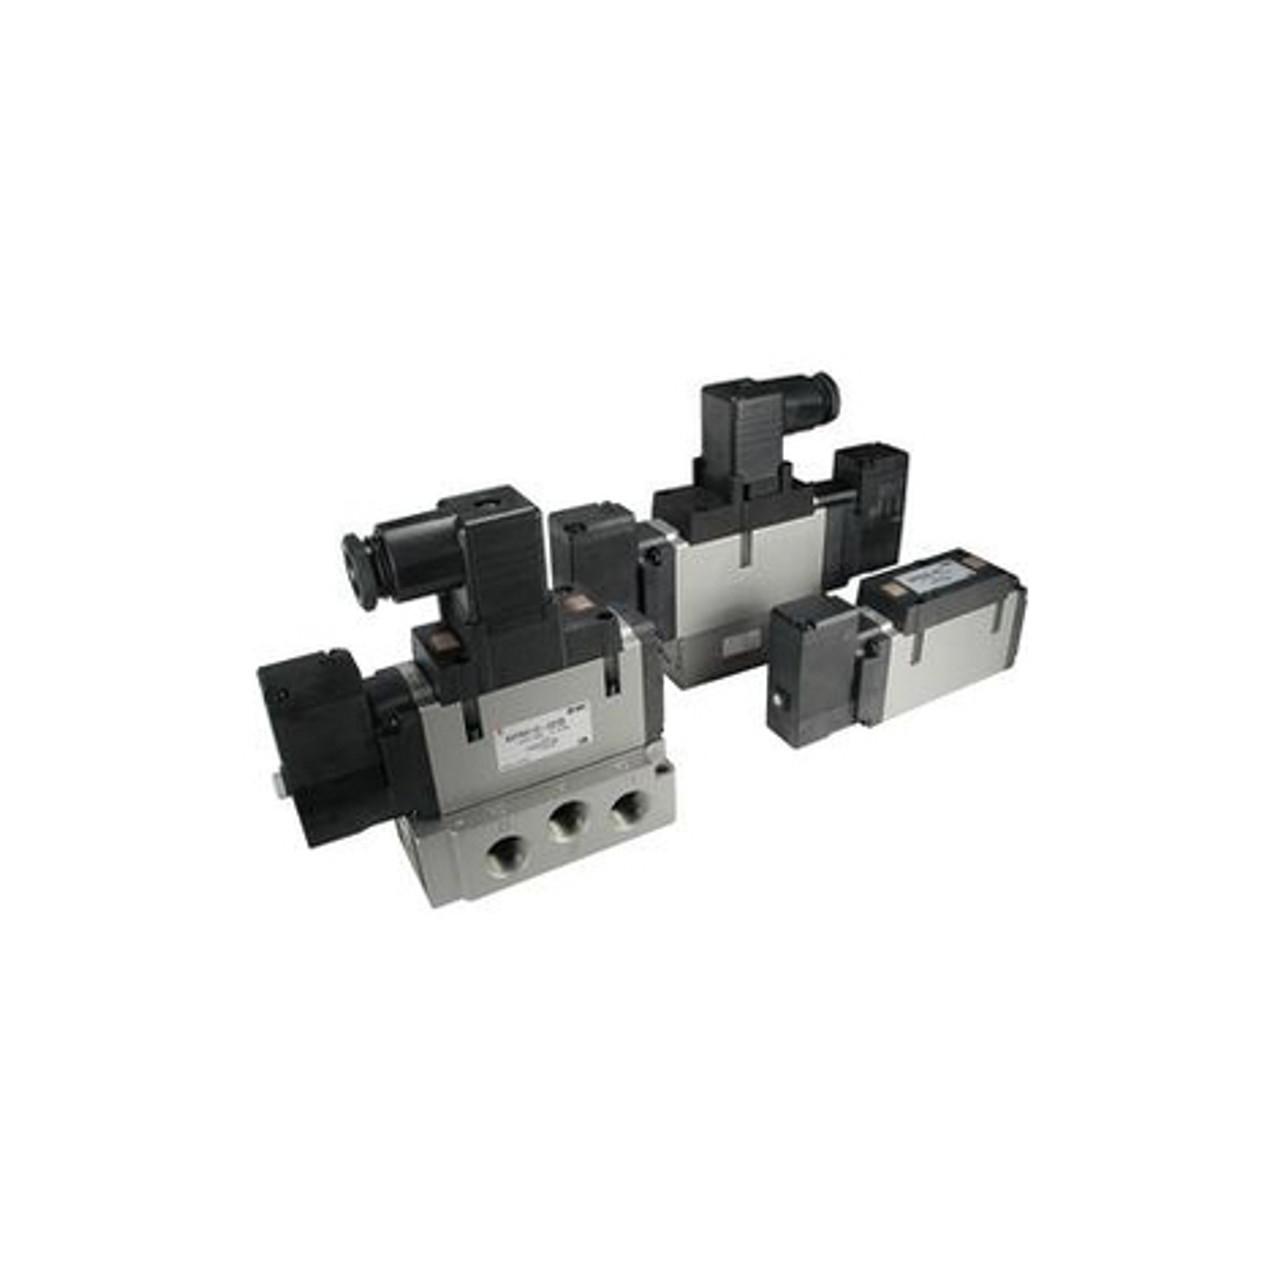 SMC NVZ5140-5DZ 24VDC NSNP